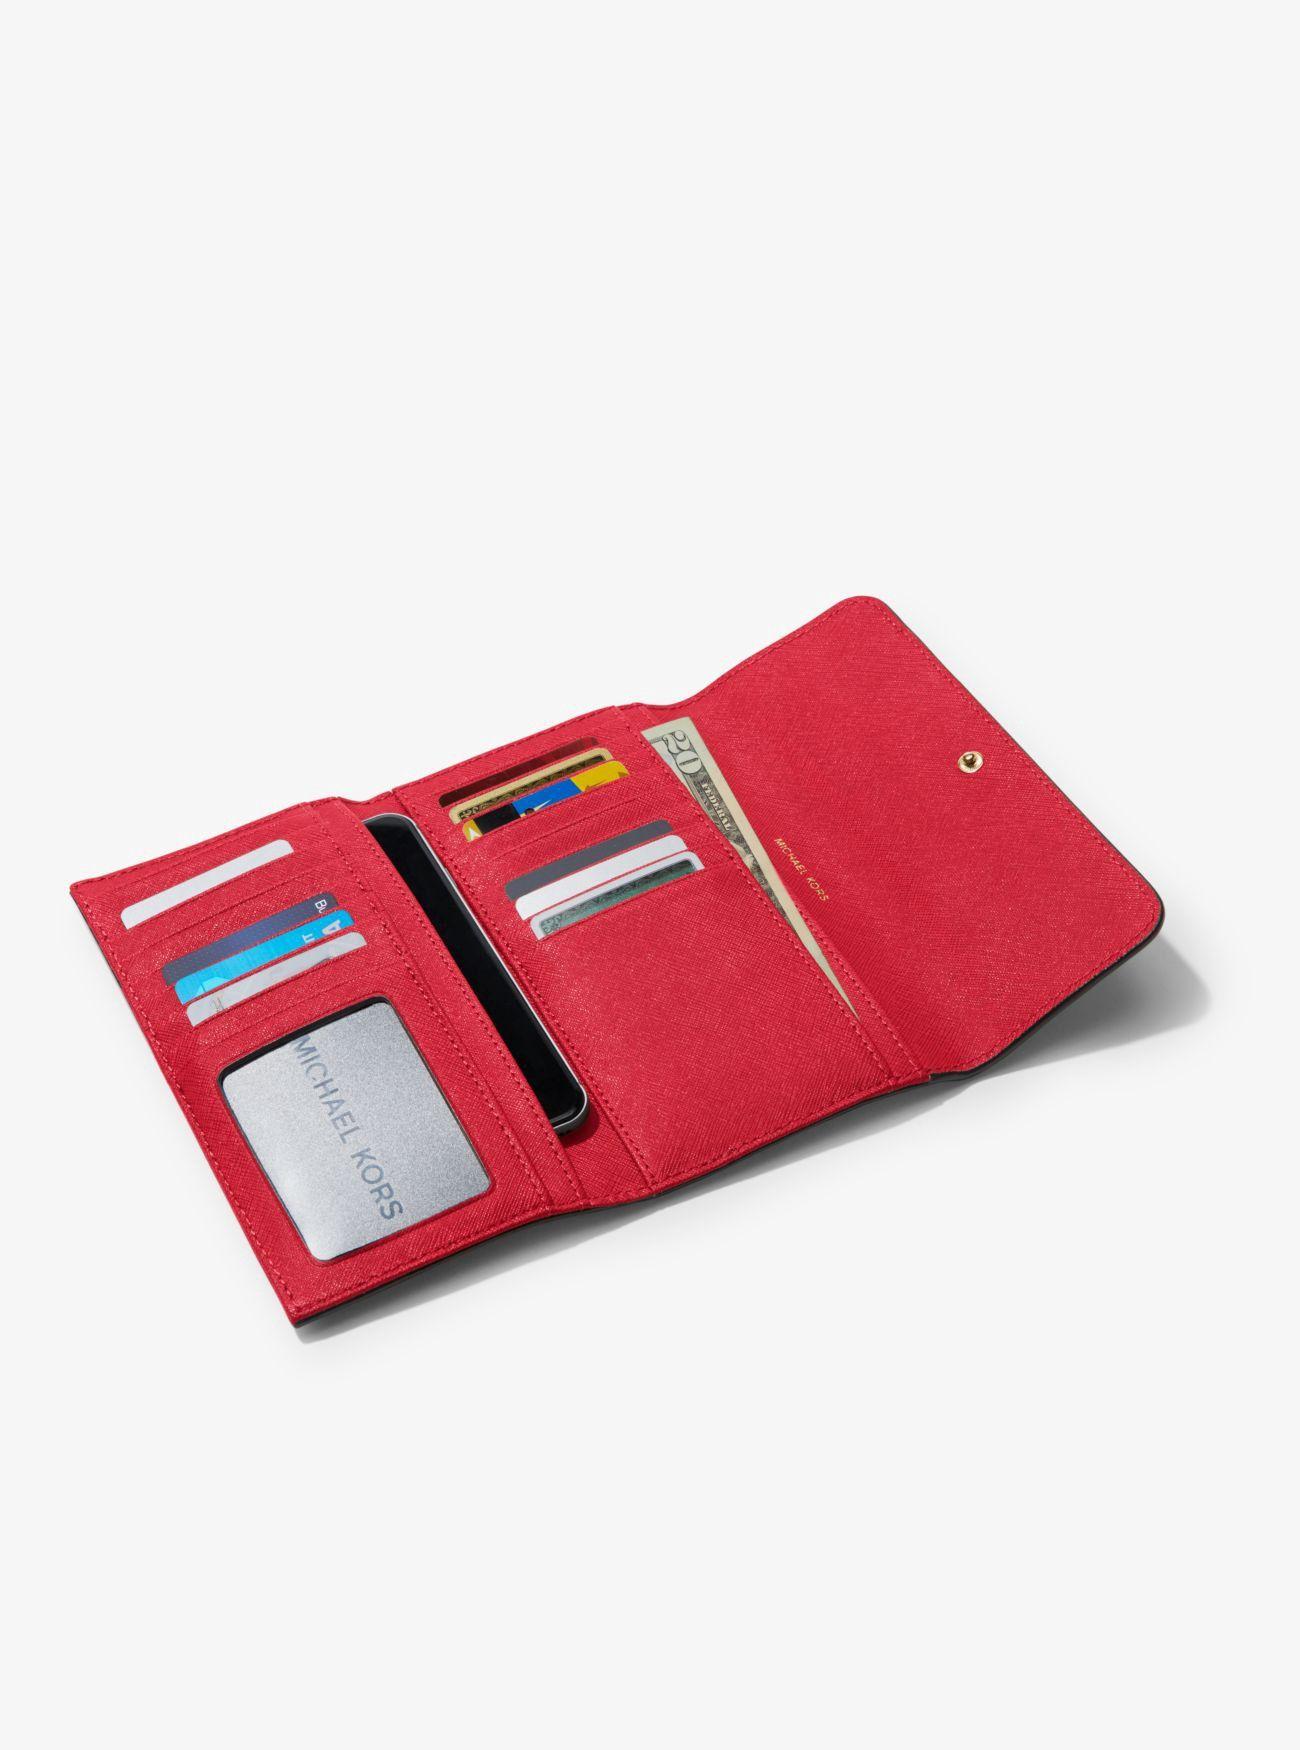 b284b932b9baf MICHAEL KORS Mercer Tri-Fold Leather Wallet.  michaelkors  all ...